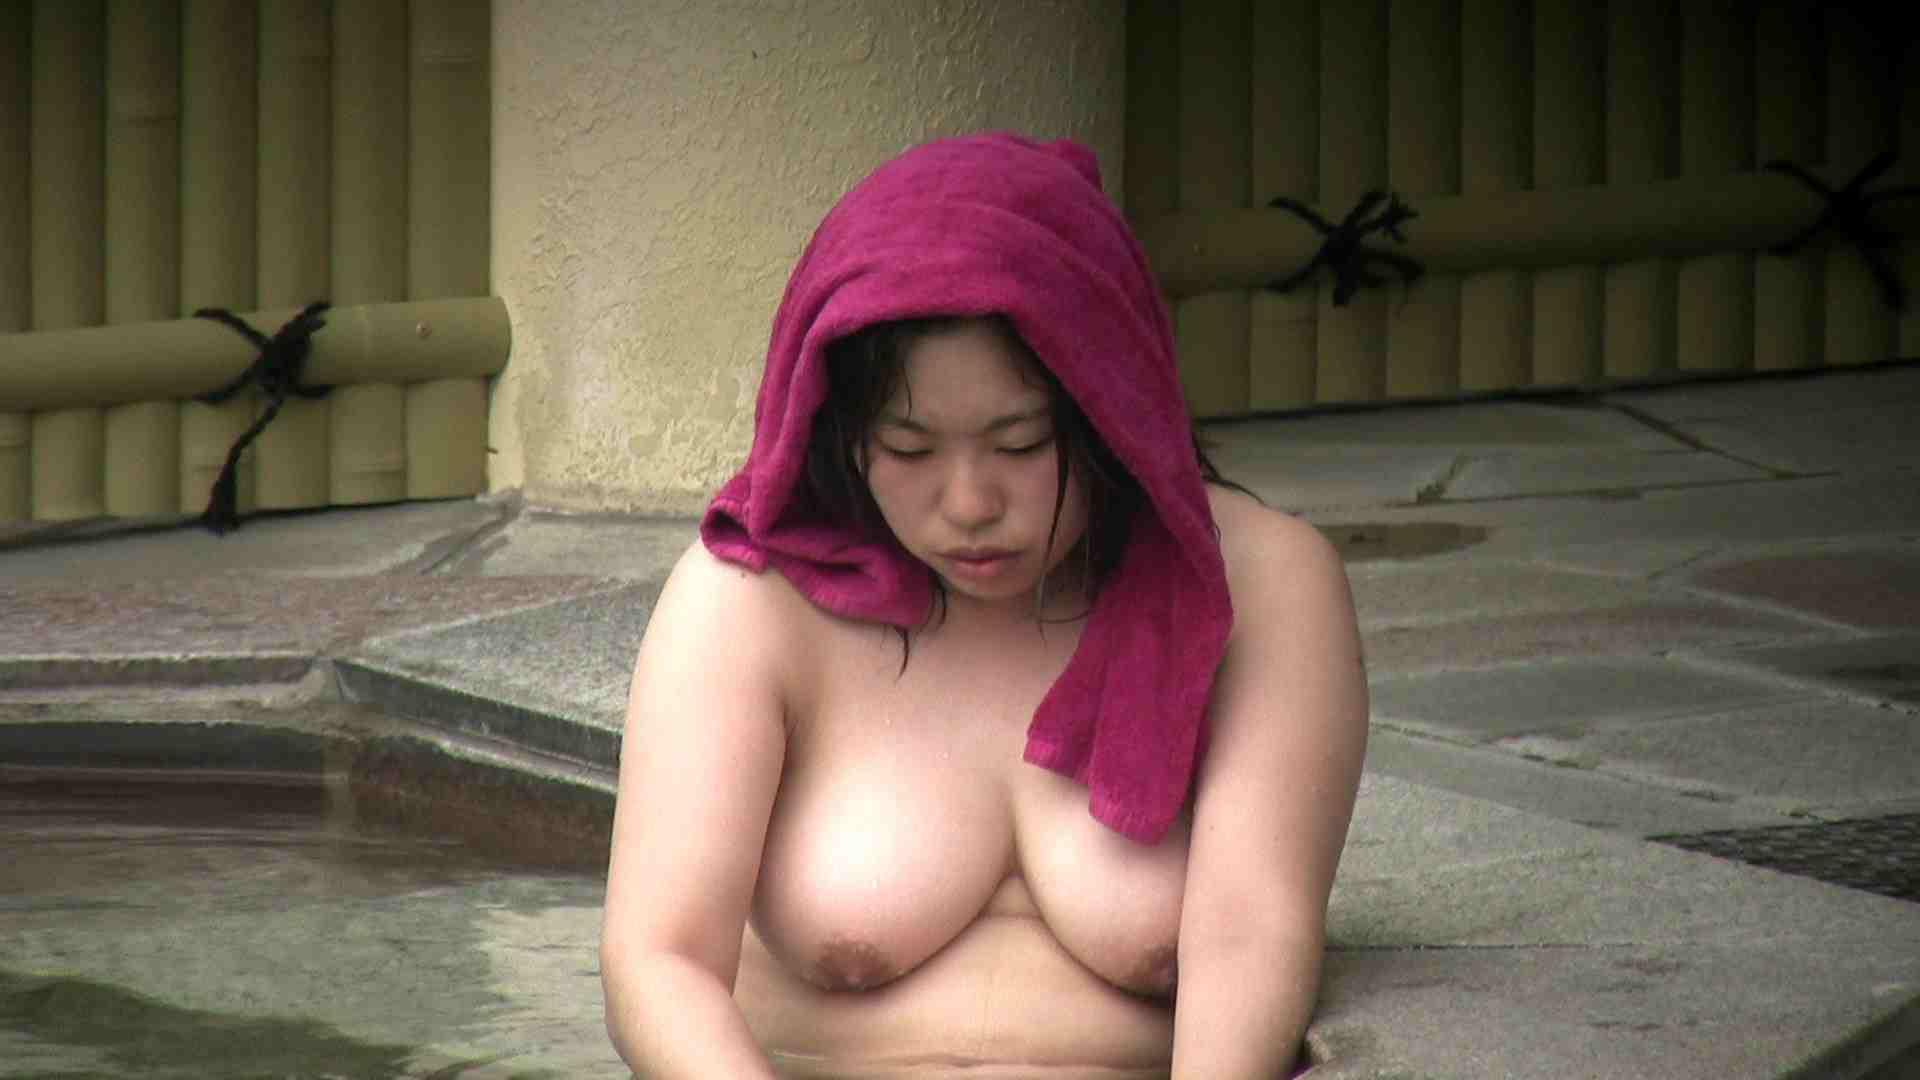 Aquaな露天風呂Vol.186 盗撮 | HなOL  78pic 5